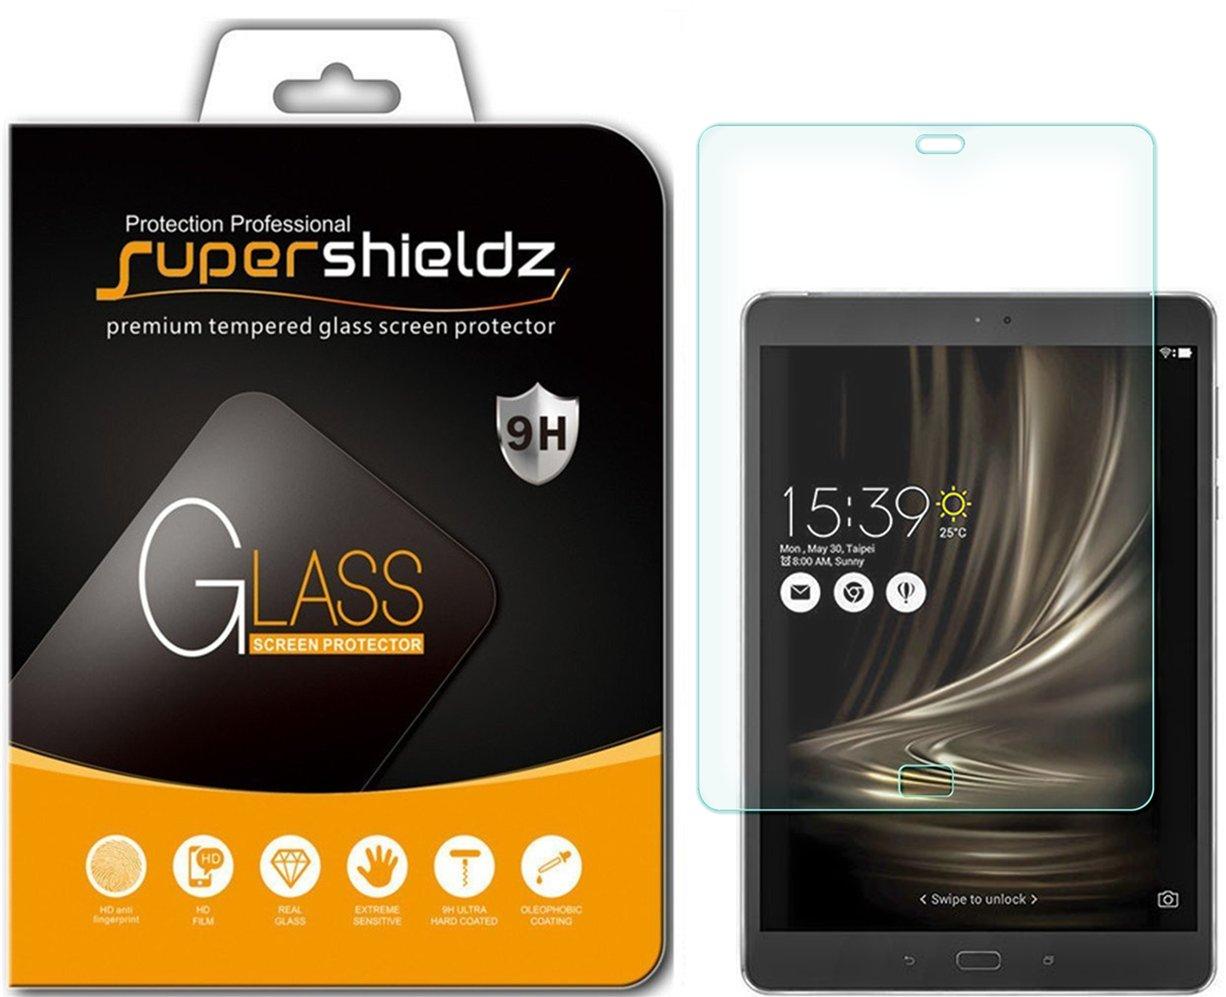 Vidrio Templado para Asus ZenPad 3S 10 (Z500M)